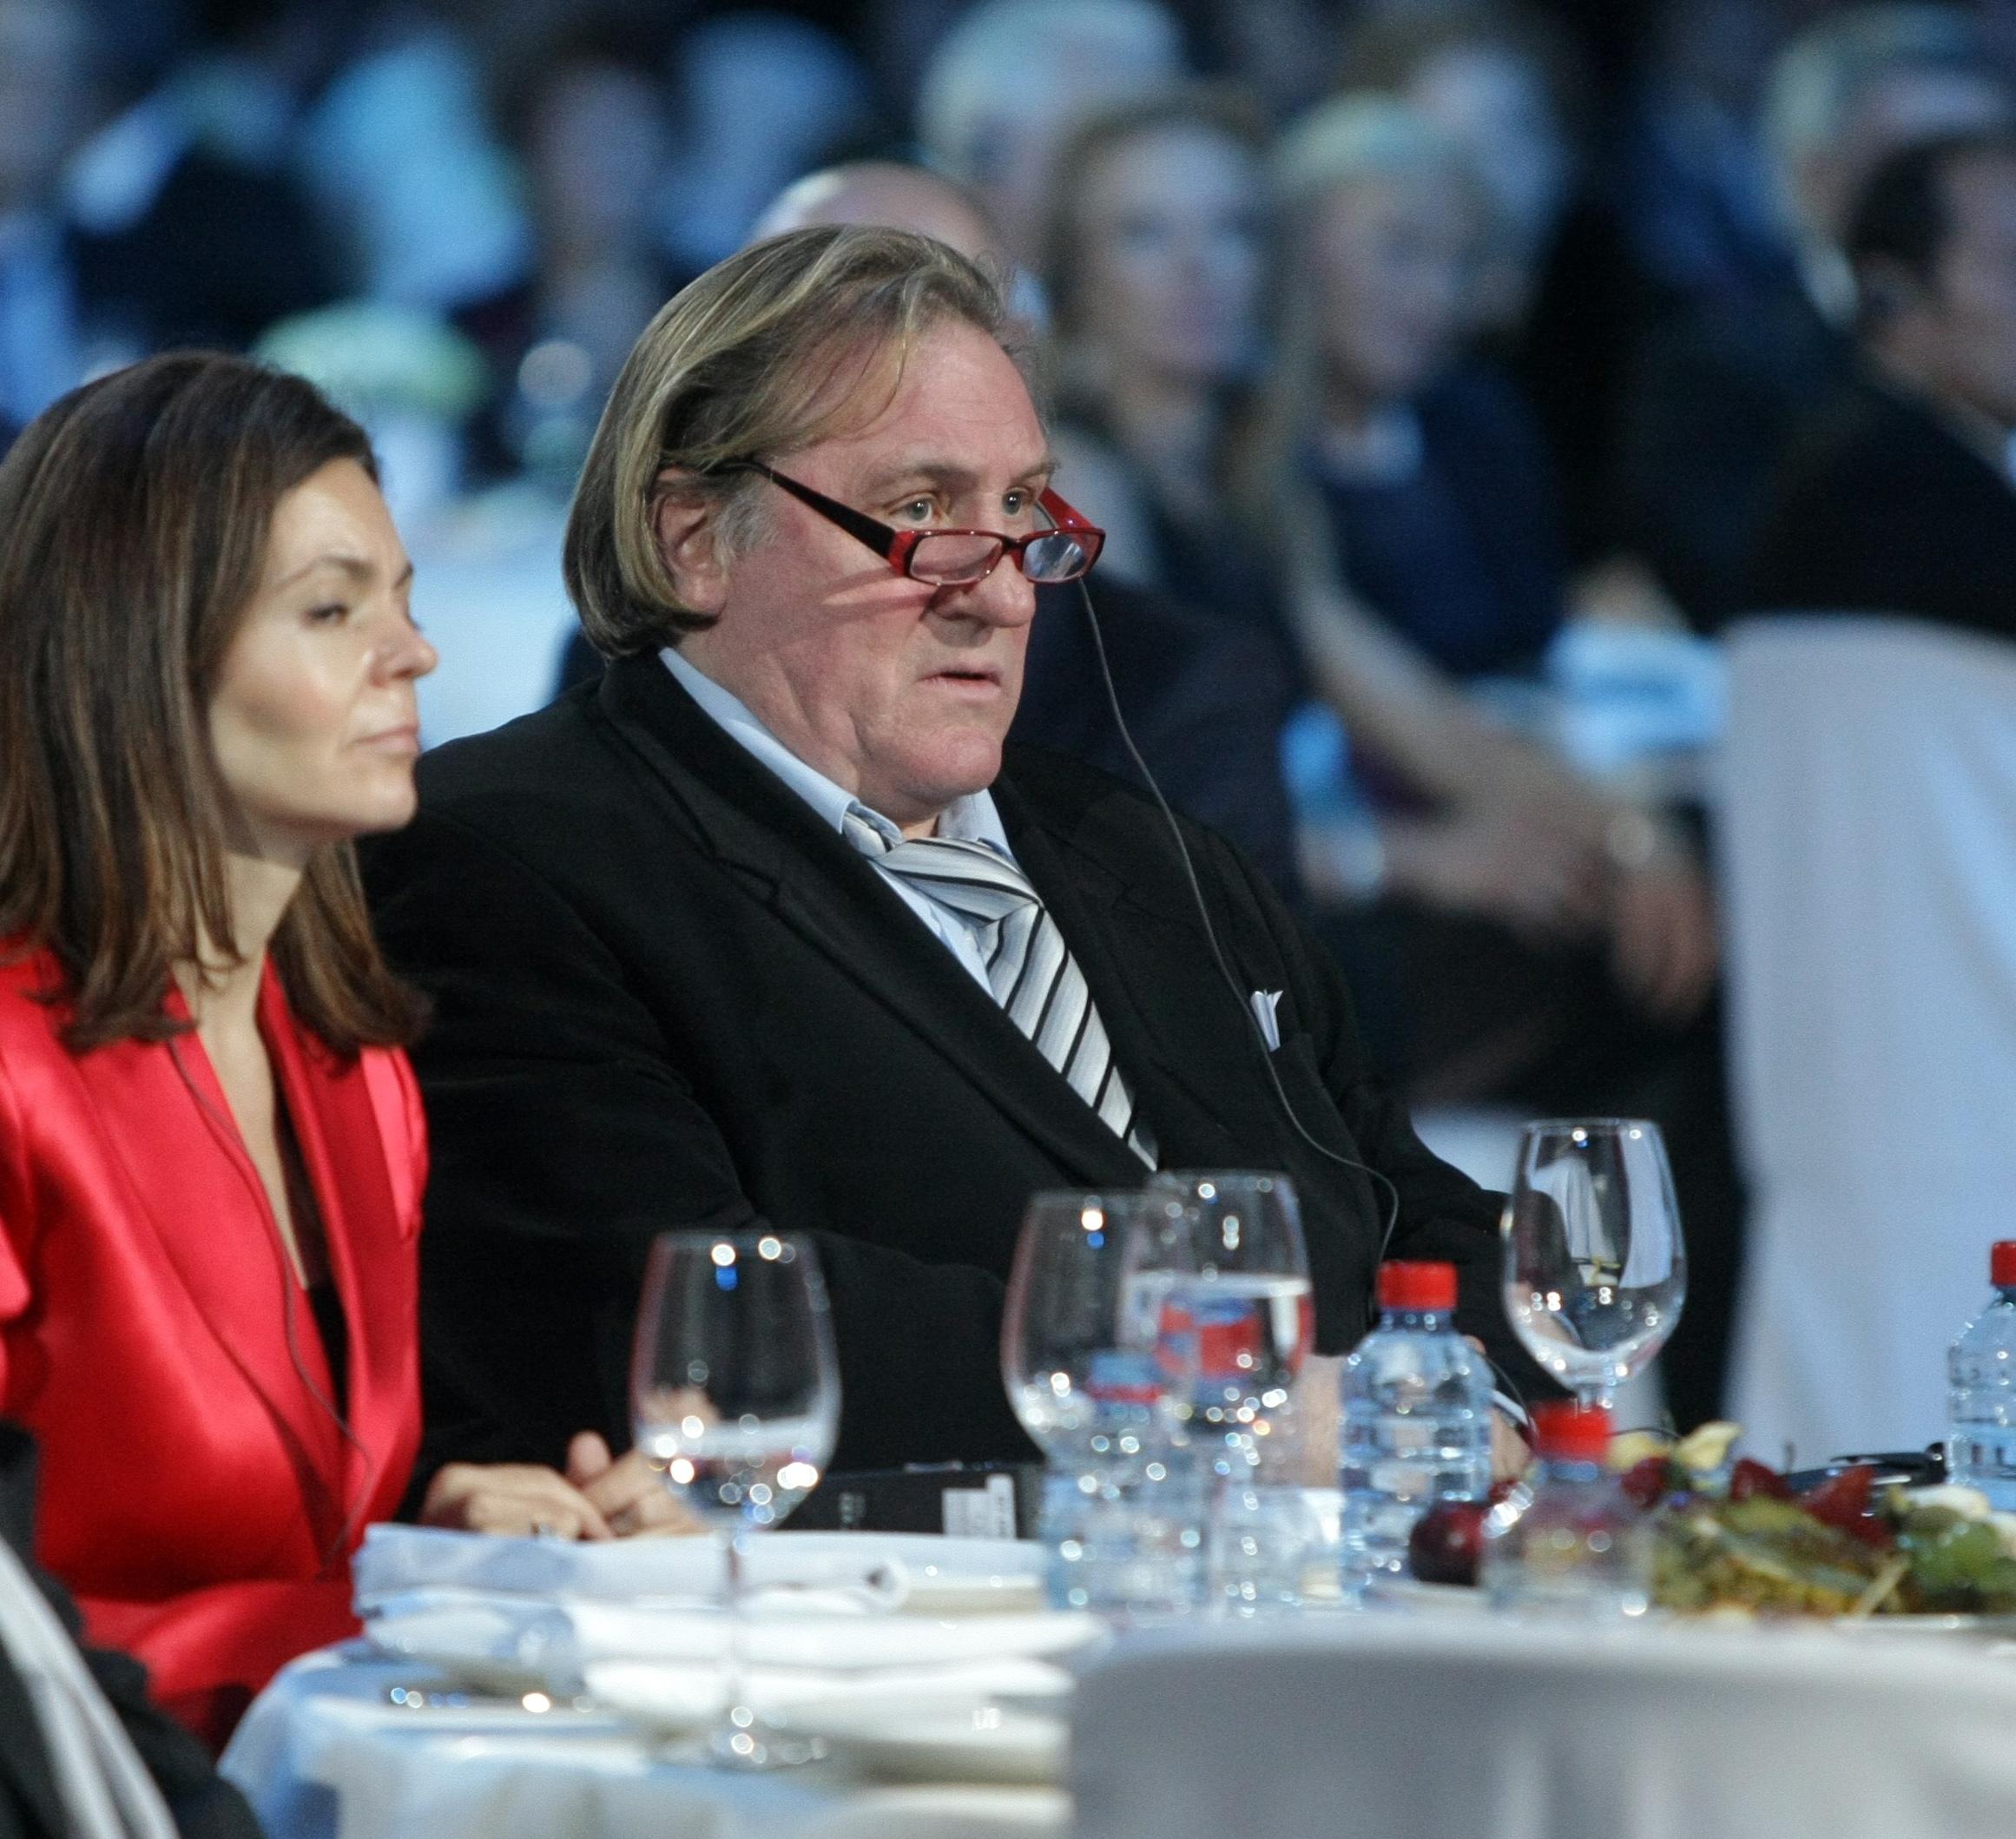 Gérard Depardieu,charme,faszinierend,schwierig,competence call center,nachdenken,eröffnung,faktor,meinung